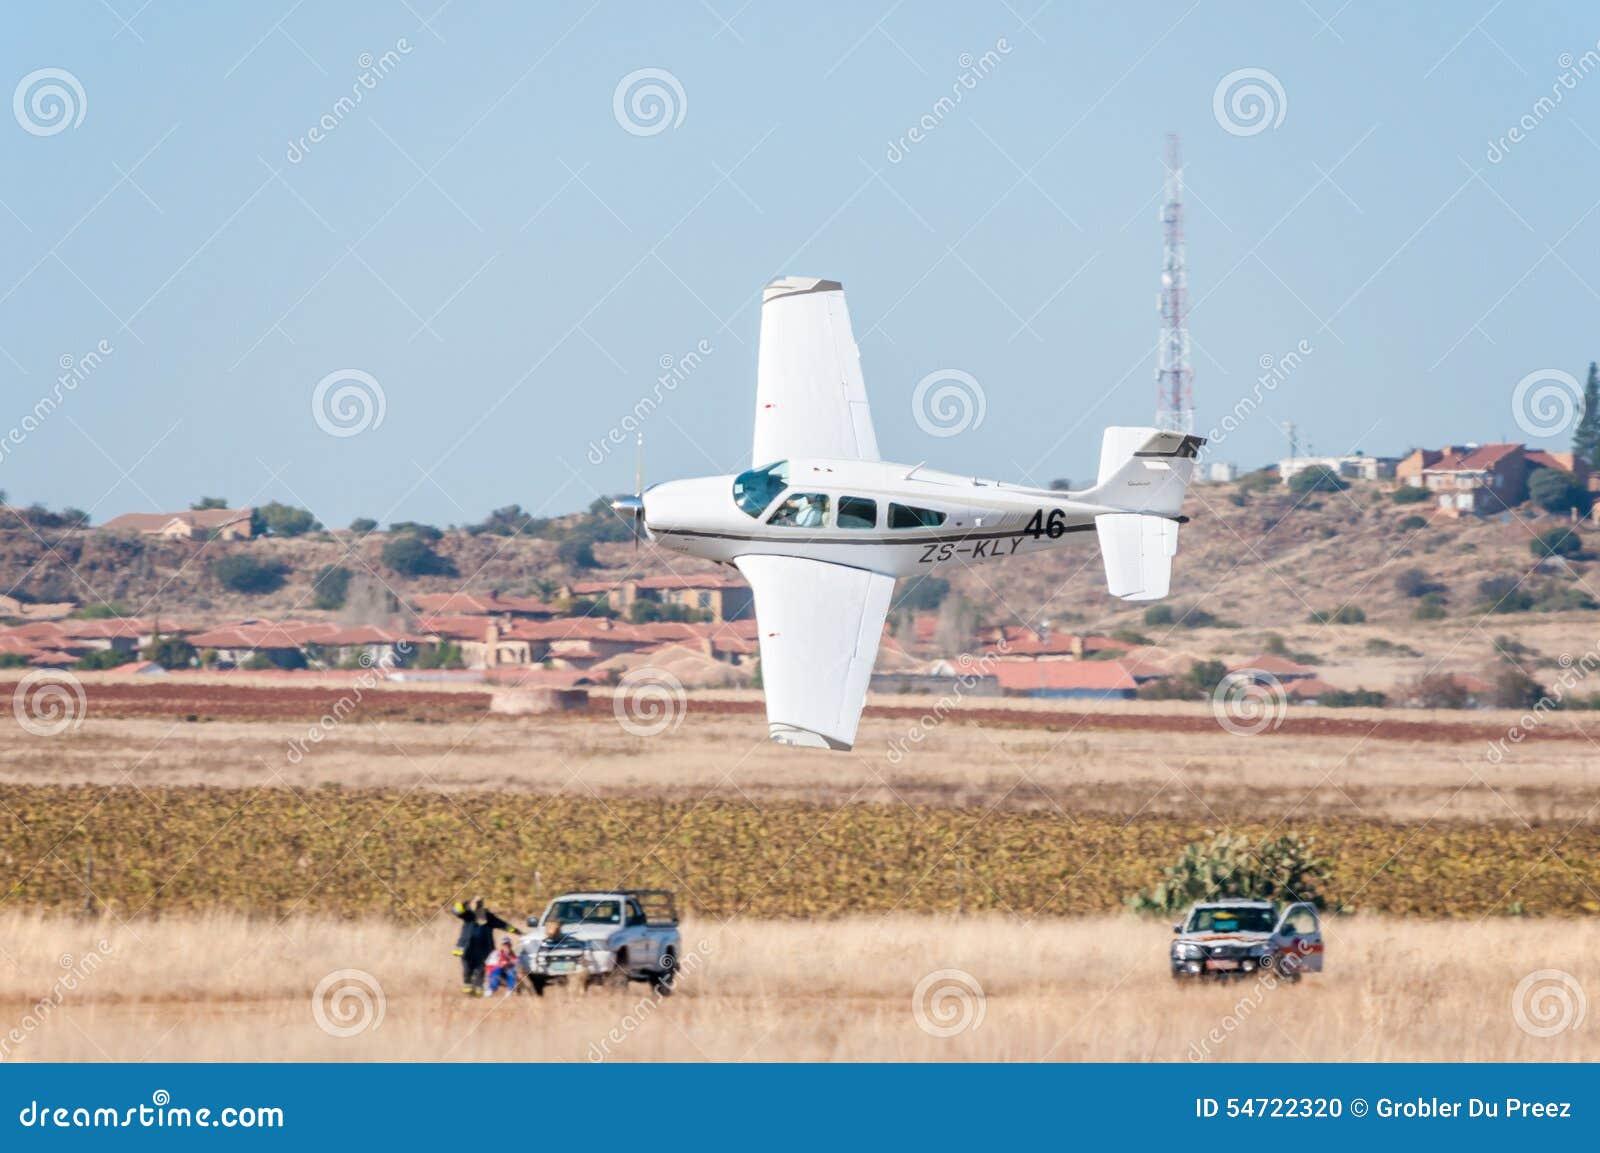 Beechcraft F33A stijgt in Presidenten Trophy Air Race op